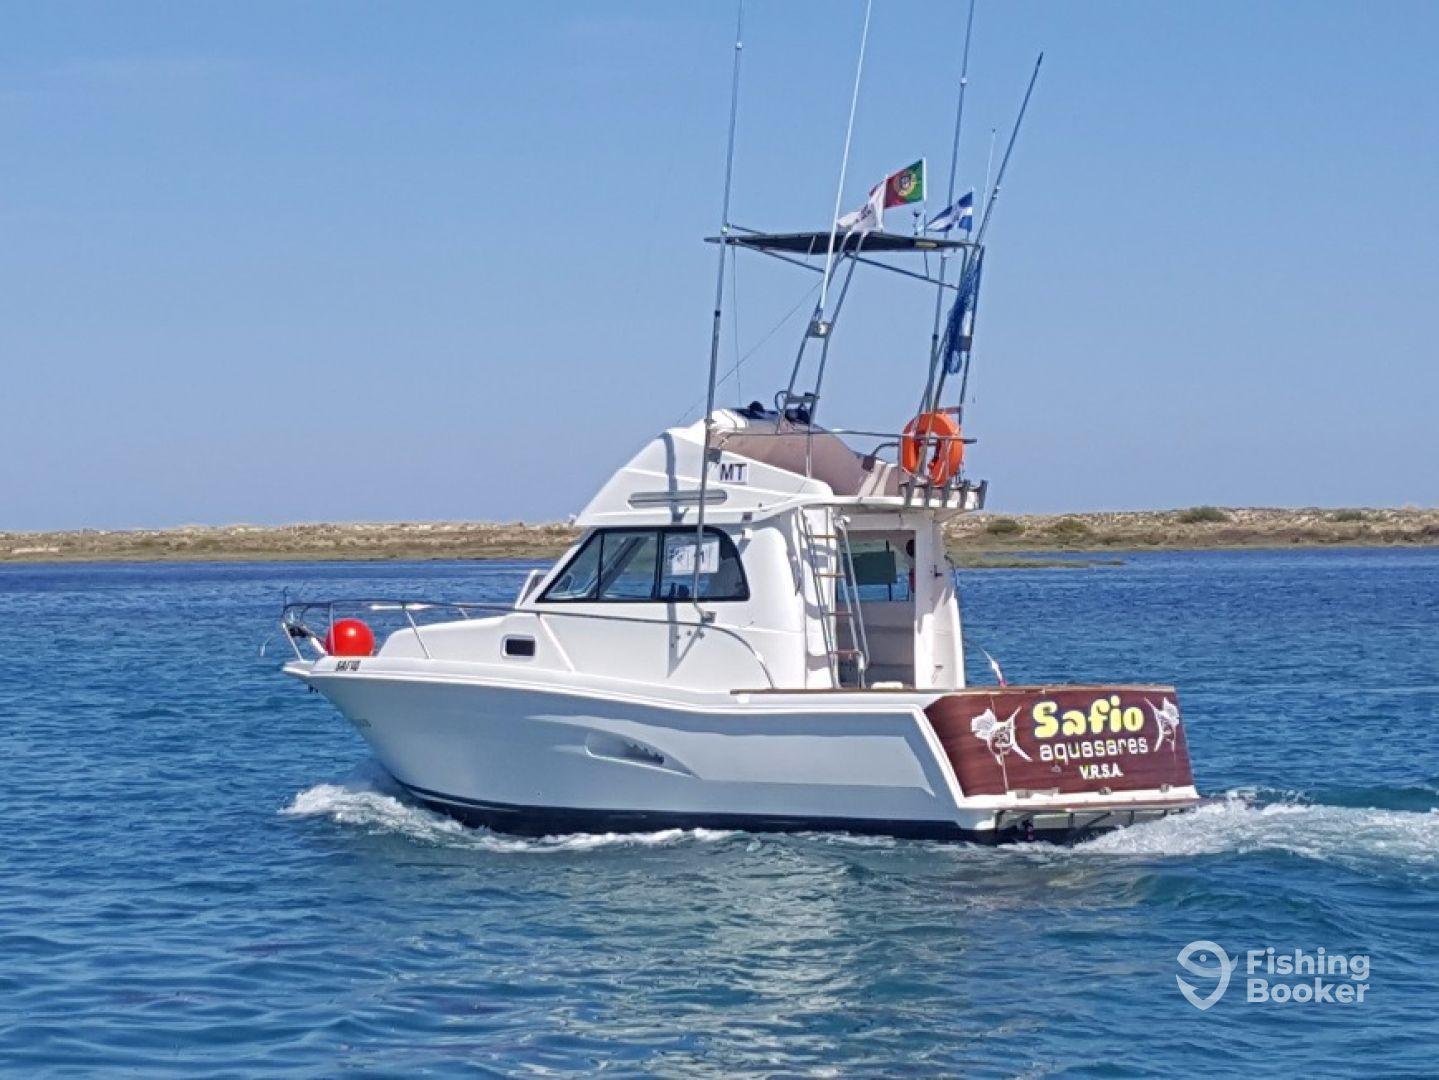 Aquasares offshore fishing charters tavira portugal for Offshore fishing charters